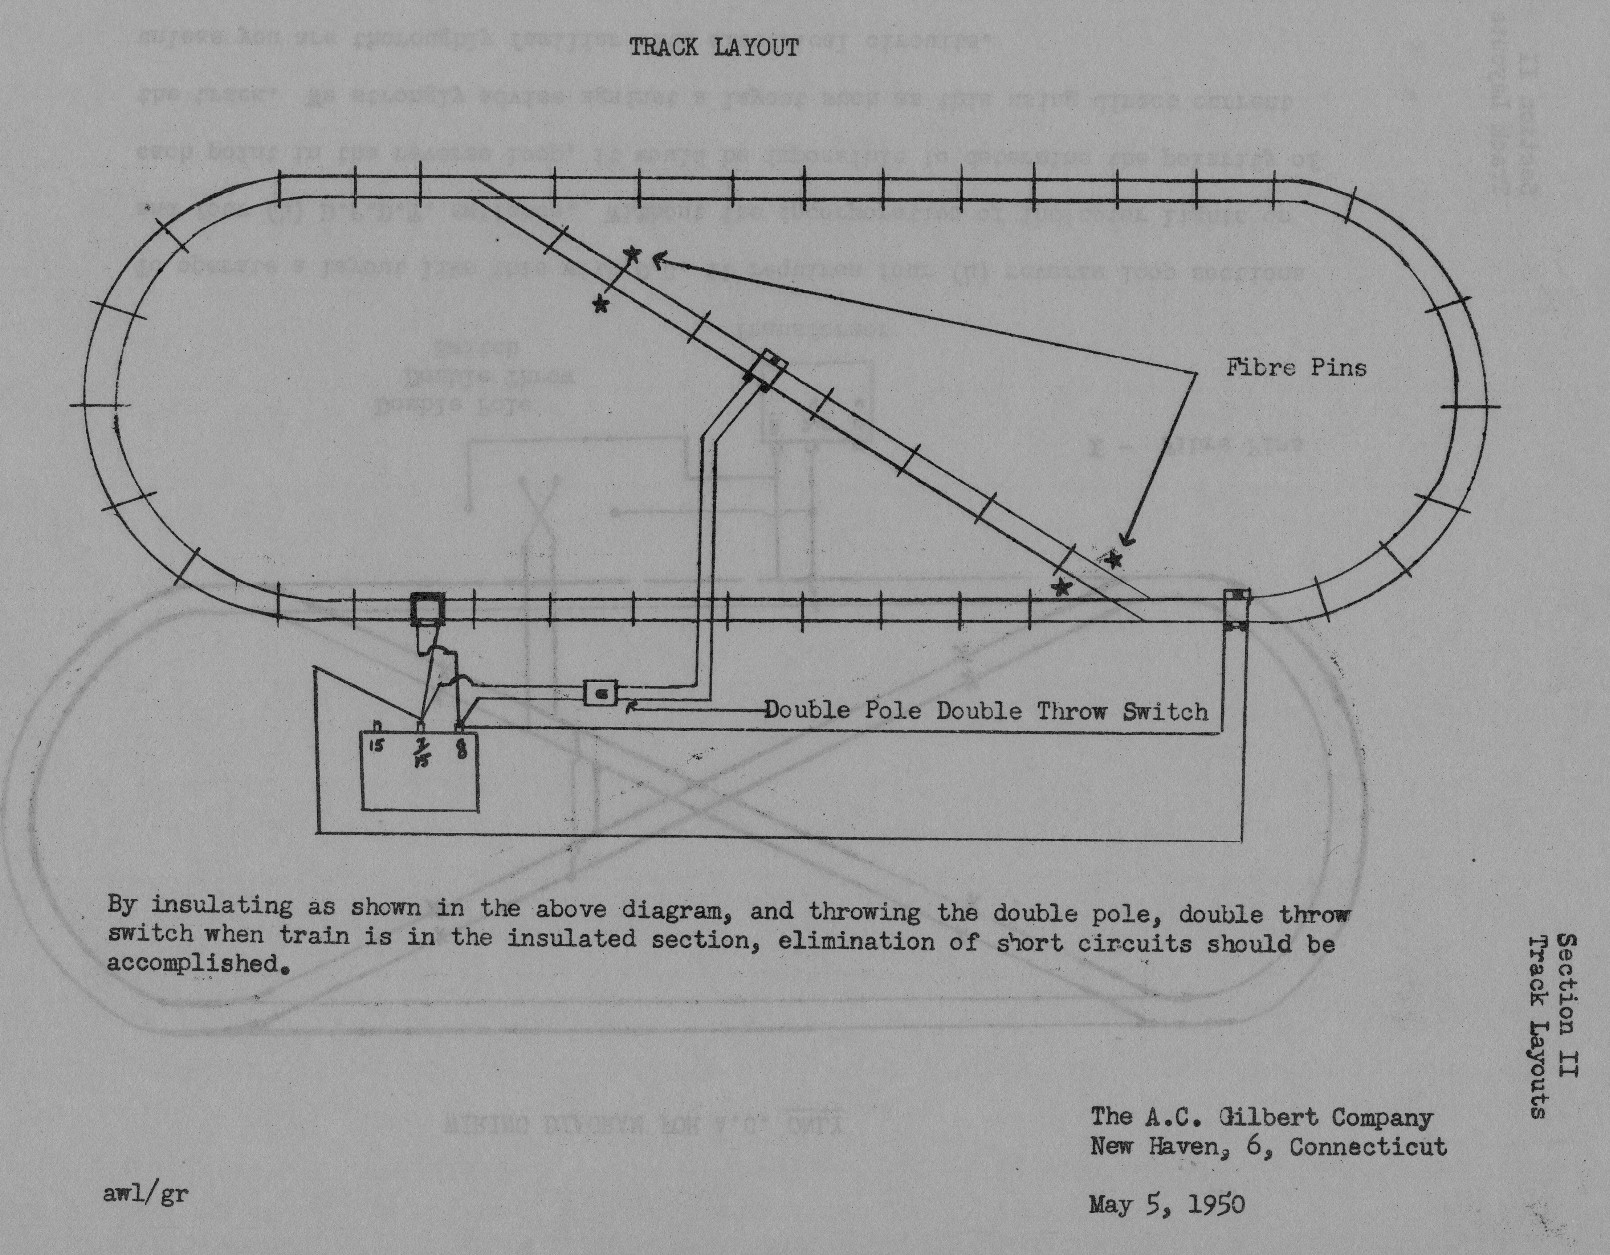 loop wiring diagram casablanca fan motor american flyer reverse layout | traindr